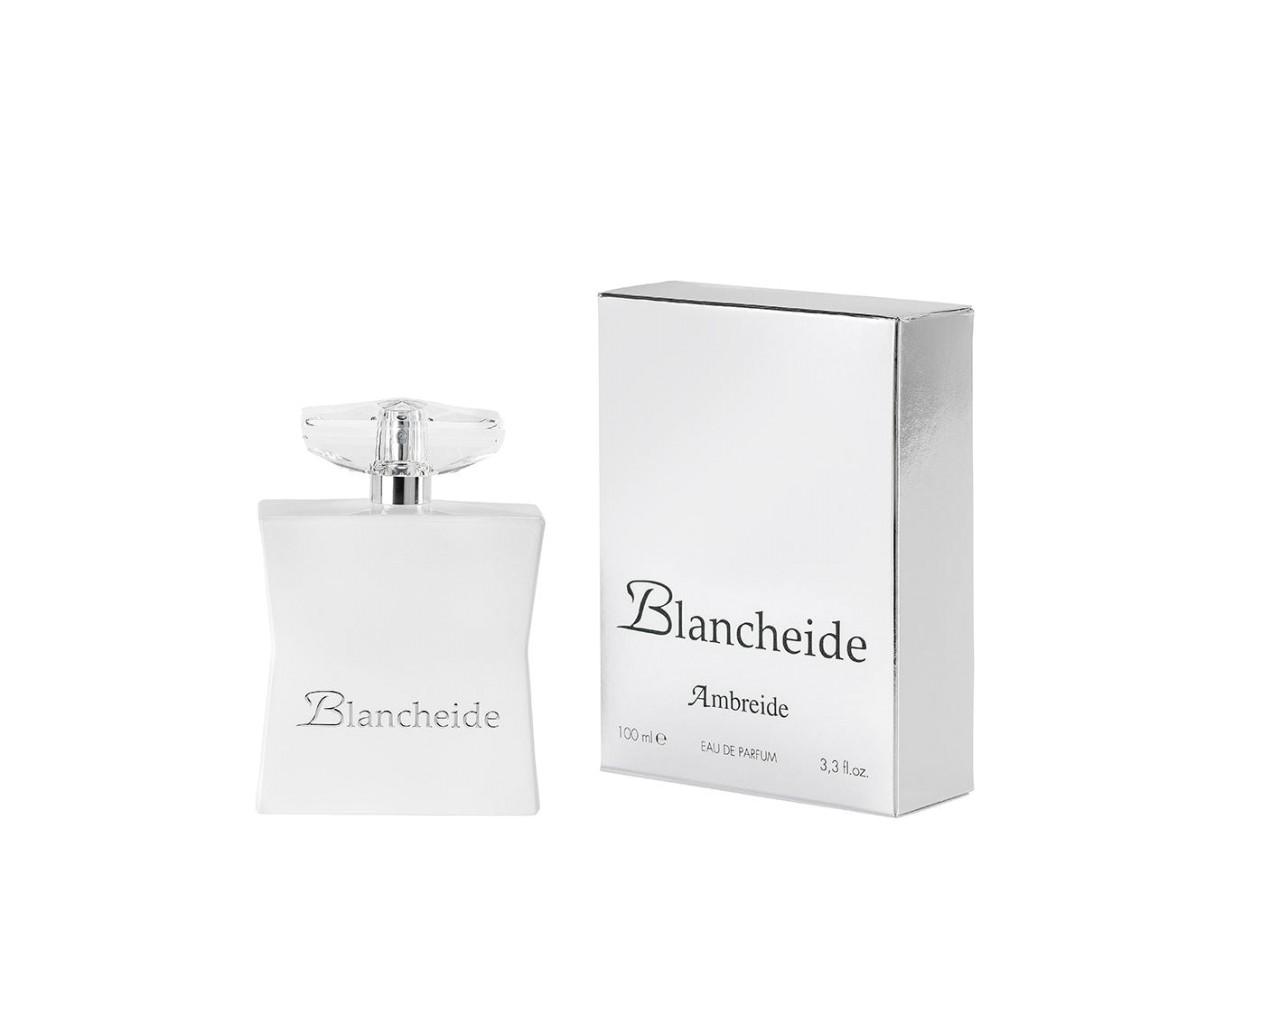 AMBREIDE BLANCHEIDE EDP 100 ML Blancheide BLAV100AM-01